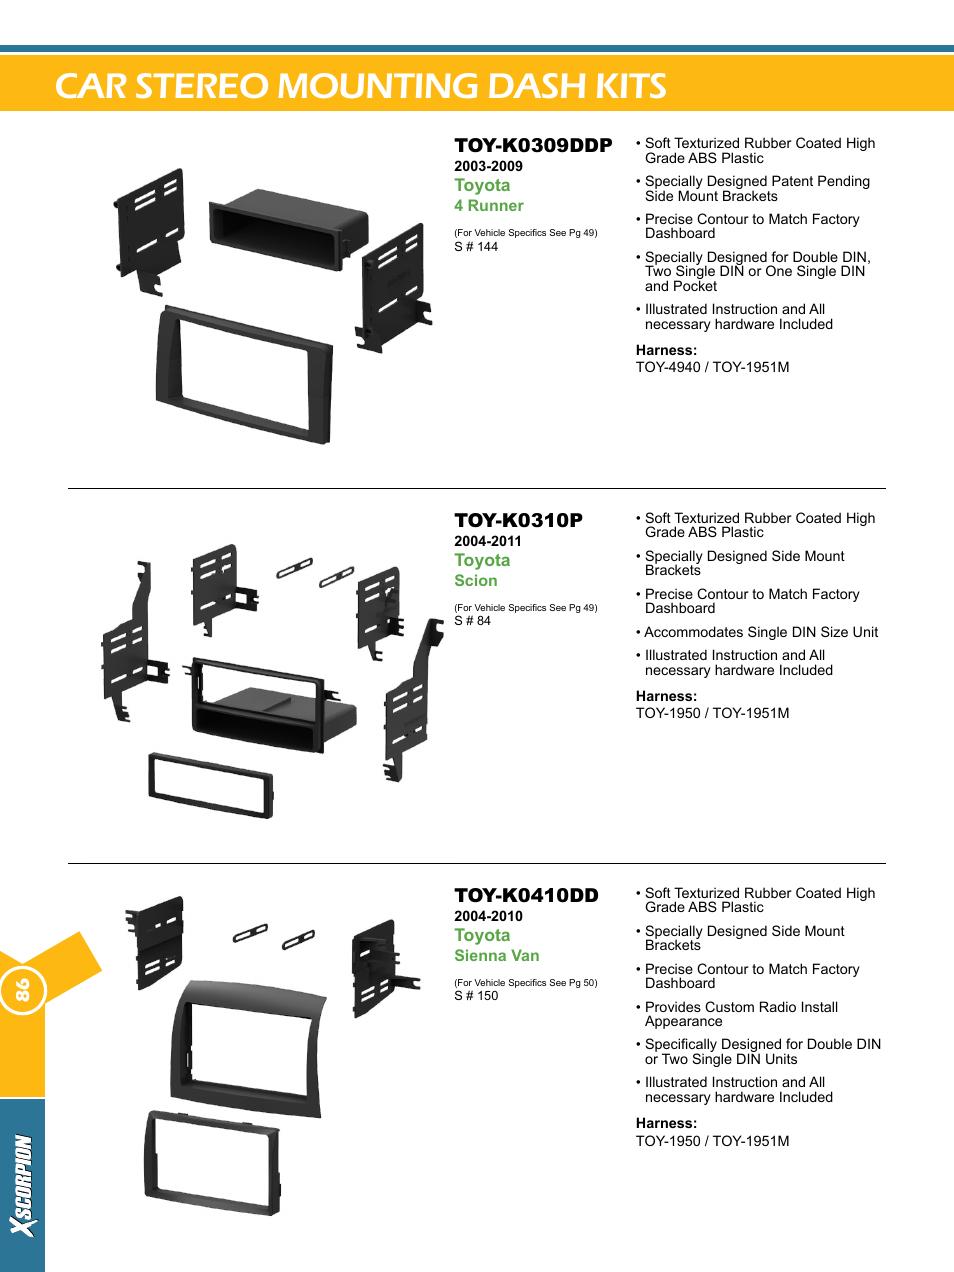 Car stereo mounting dash kits, Toy-k0309ddp, Toy-k0310p | Toy-